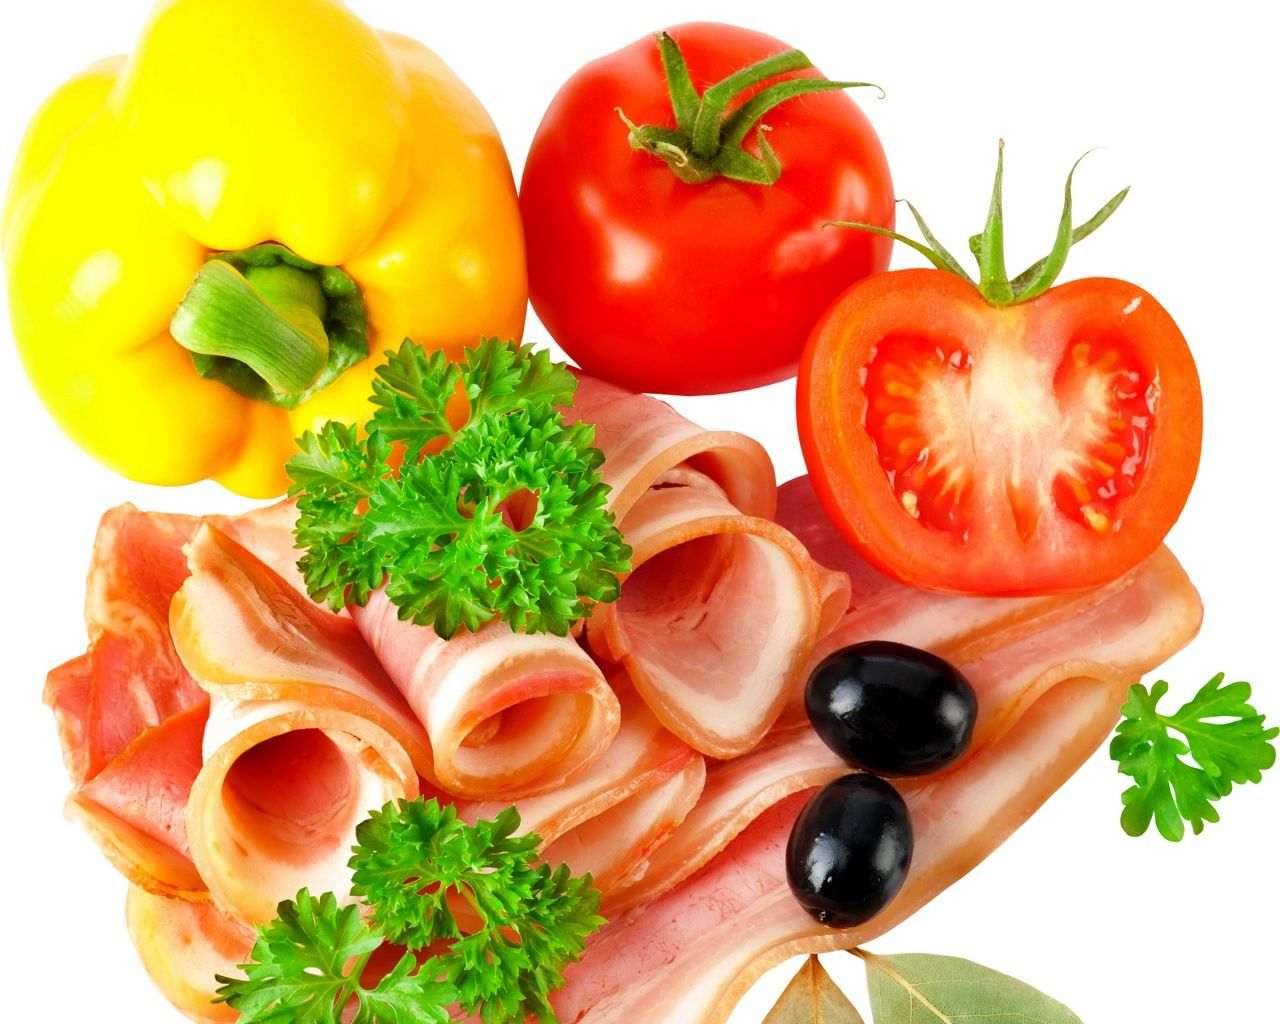 Charcuterie - Légumes - Tomates - Wallpaper - Free